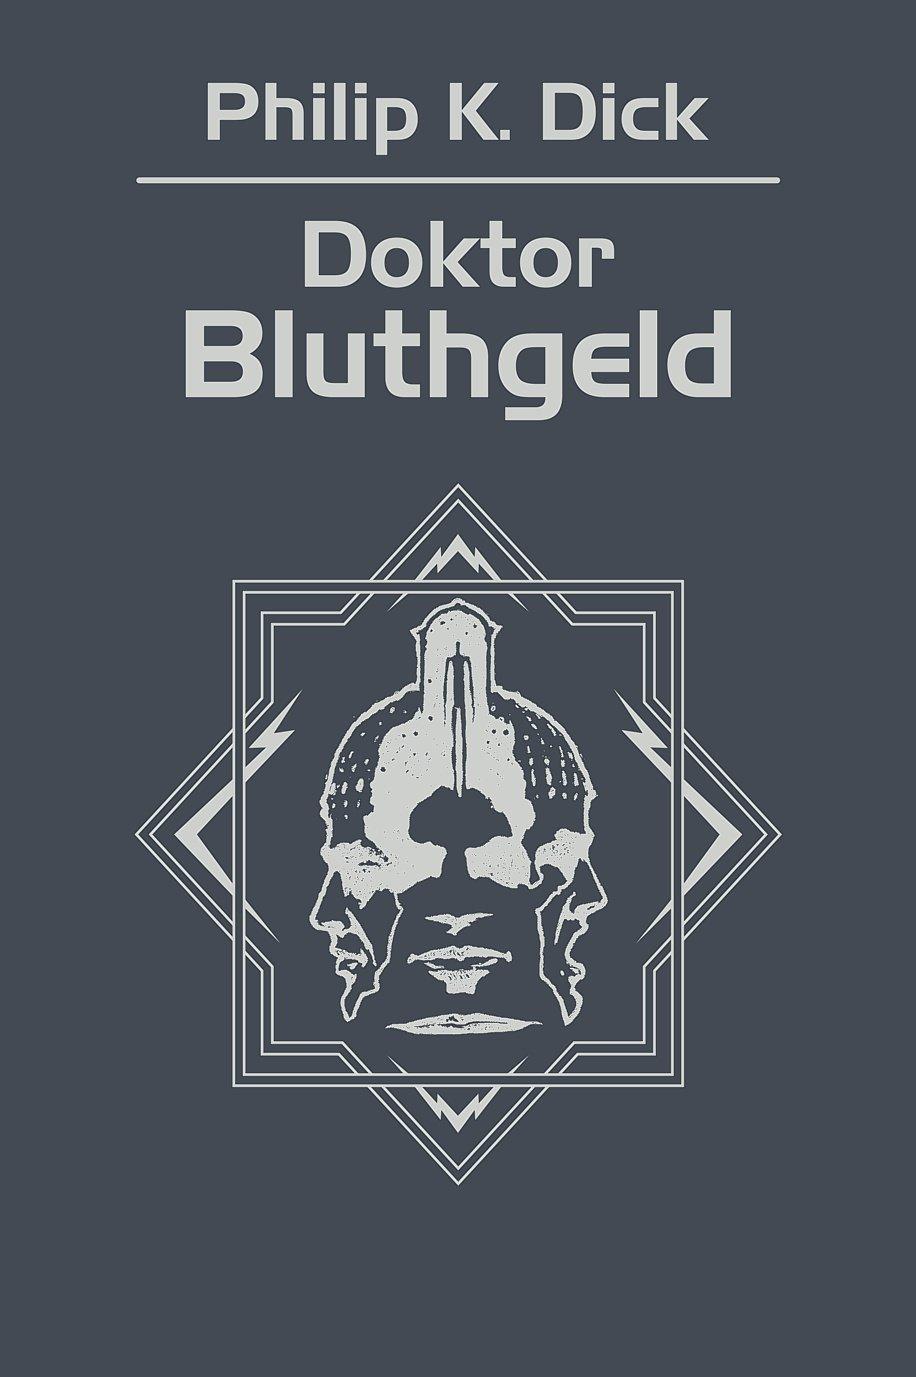 Doktor Bluthgeld - Ebook (Książka na Kindle) do pobrania w formacie MOBI